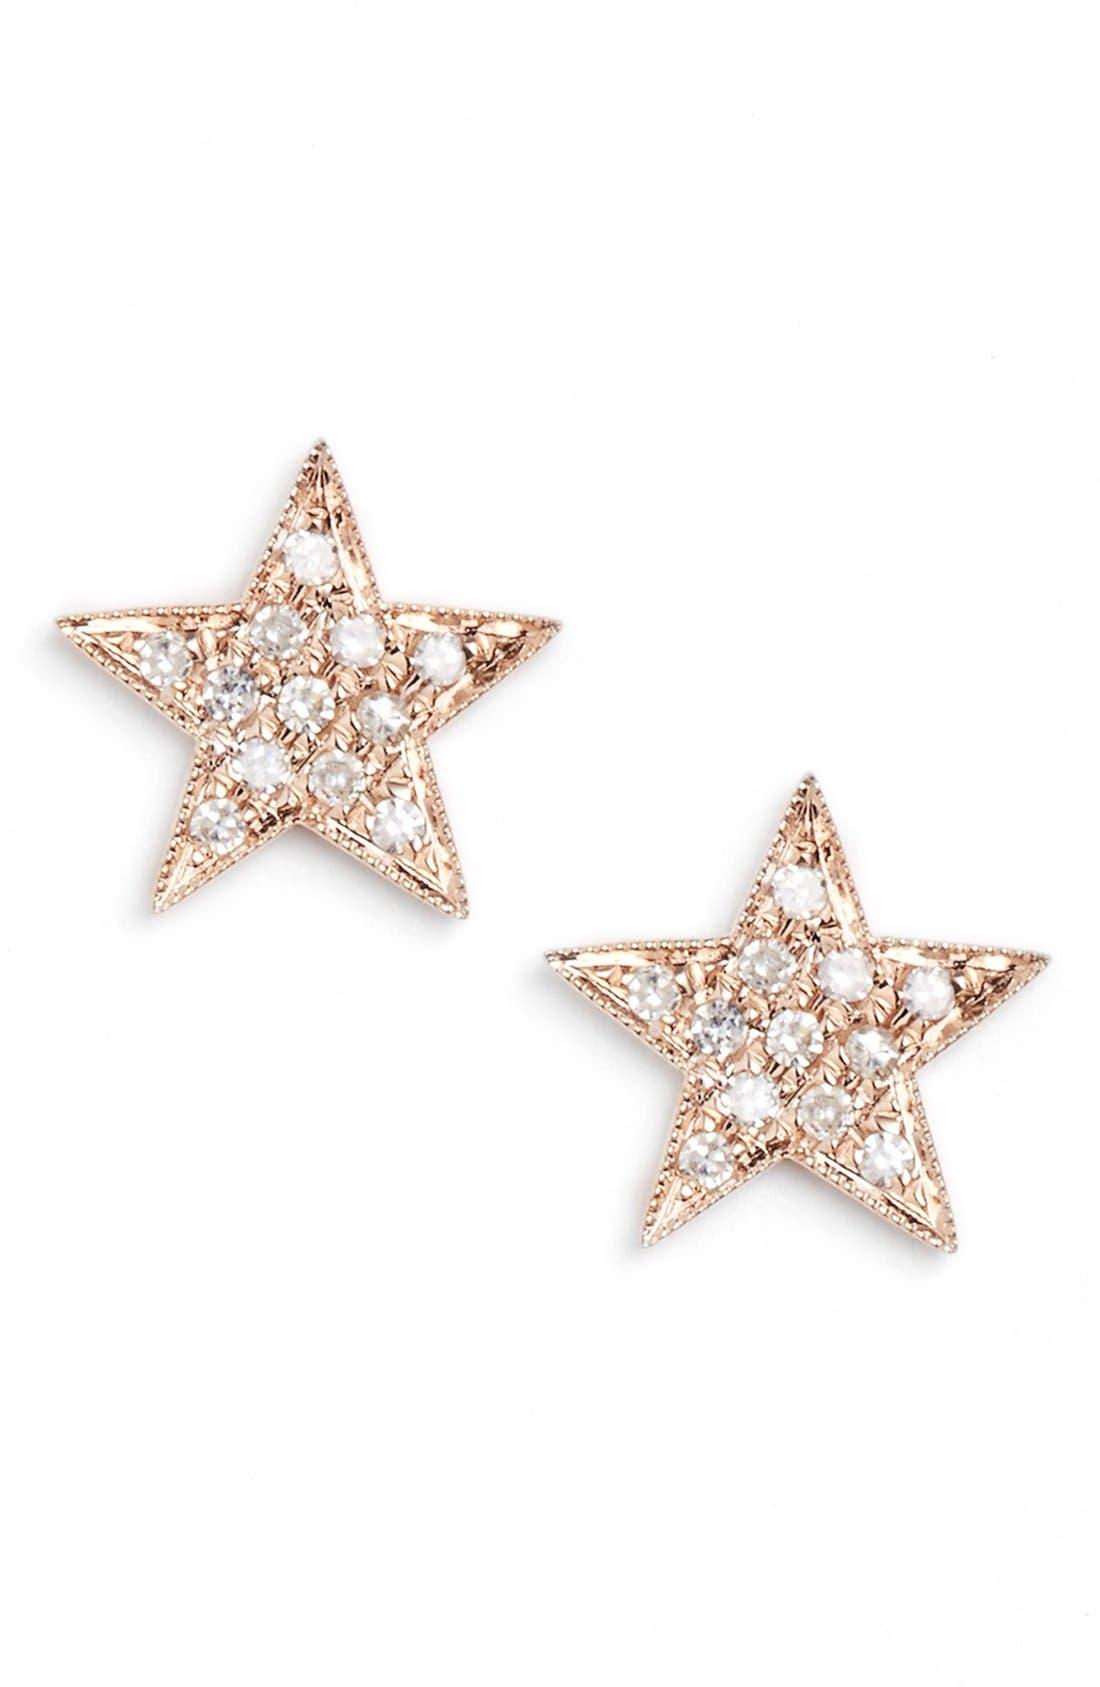 DANA REBECCA DESIGNS Julianne Himiko Diamond Star Stud Earrings